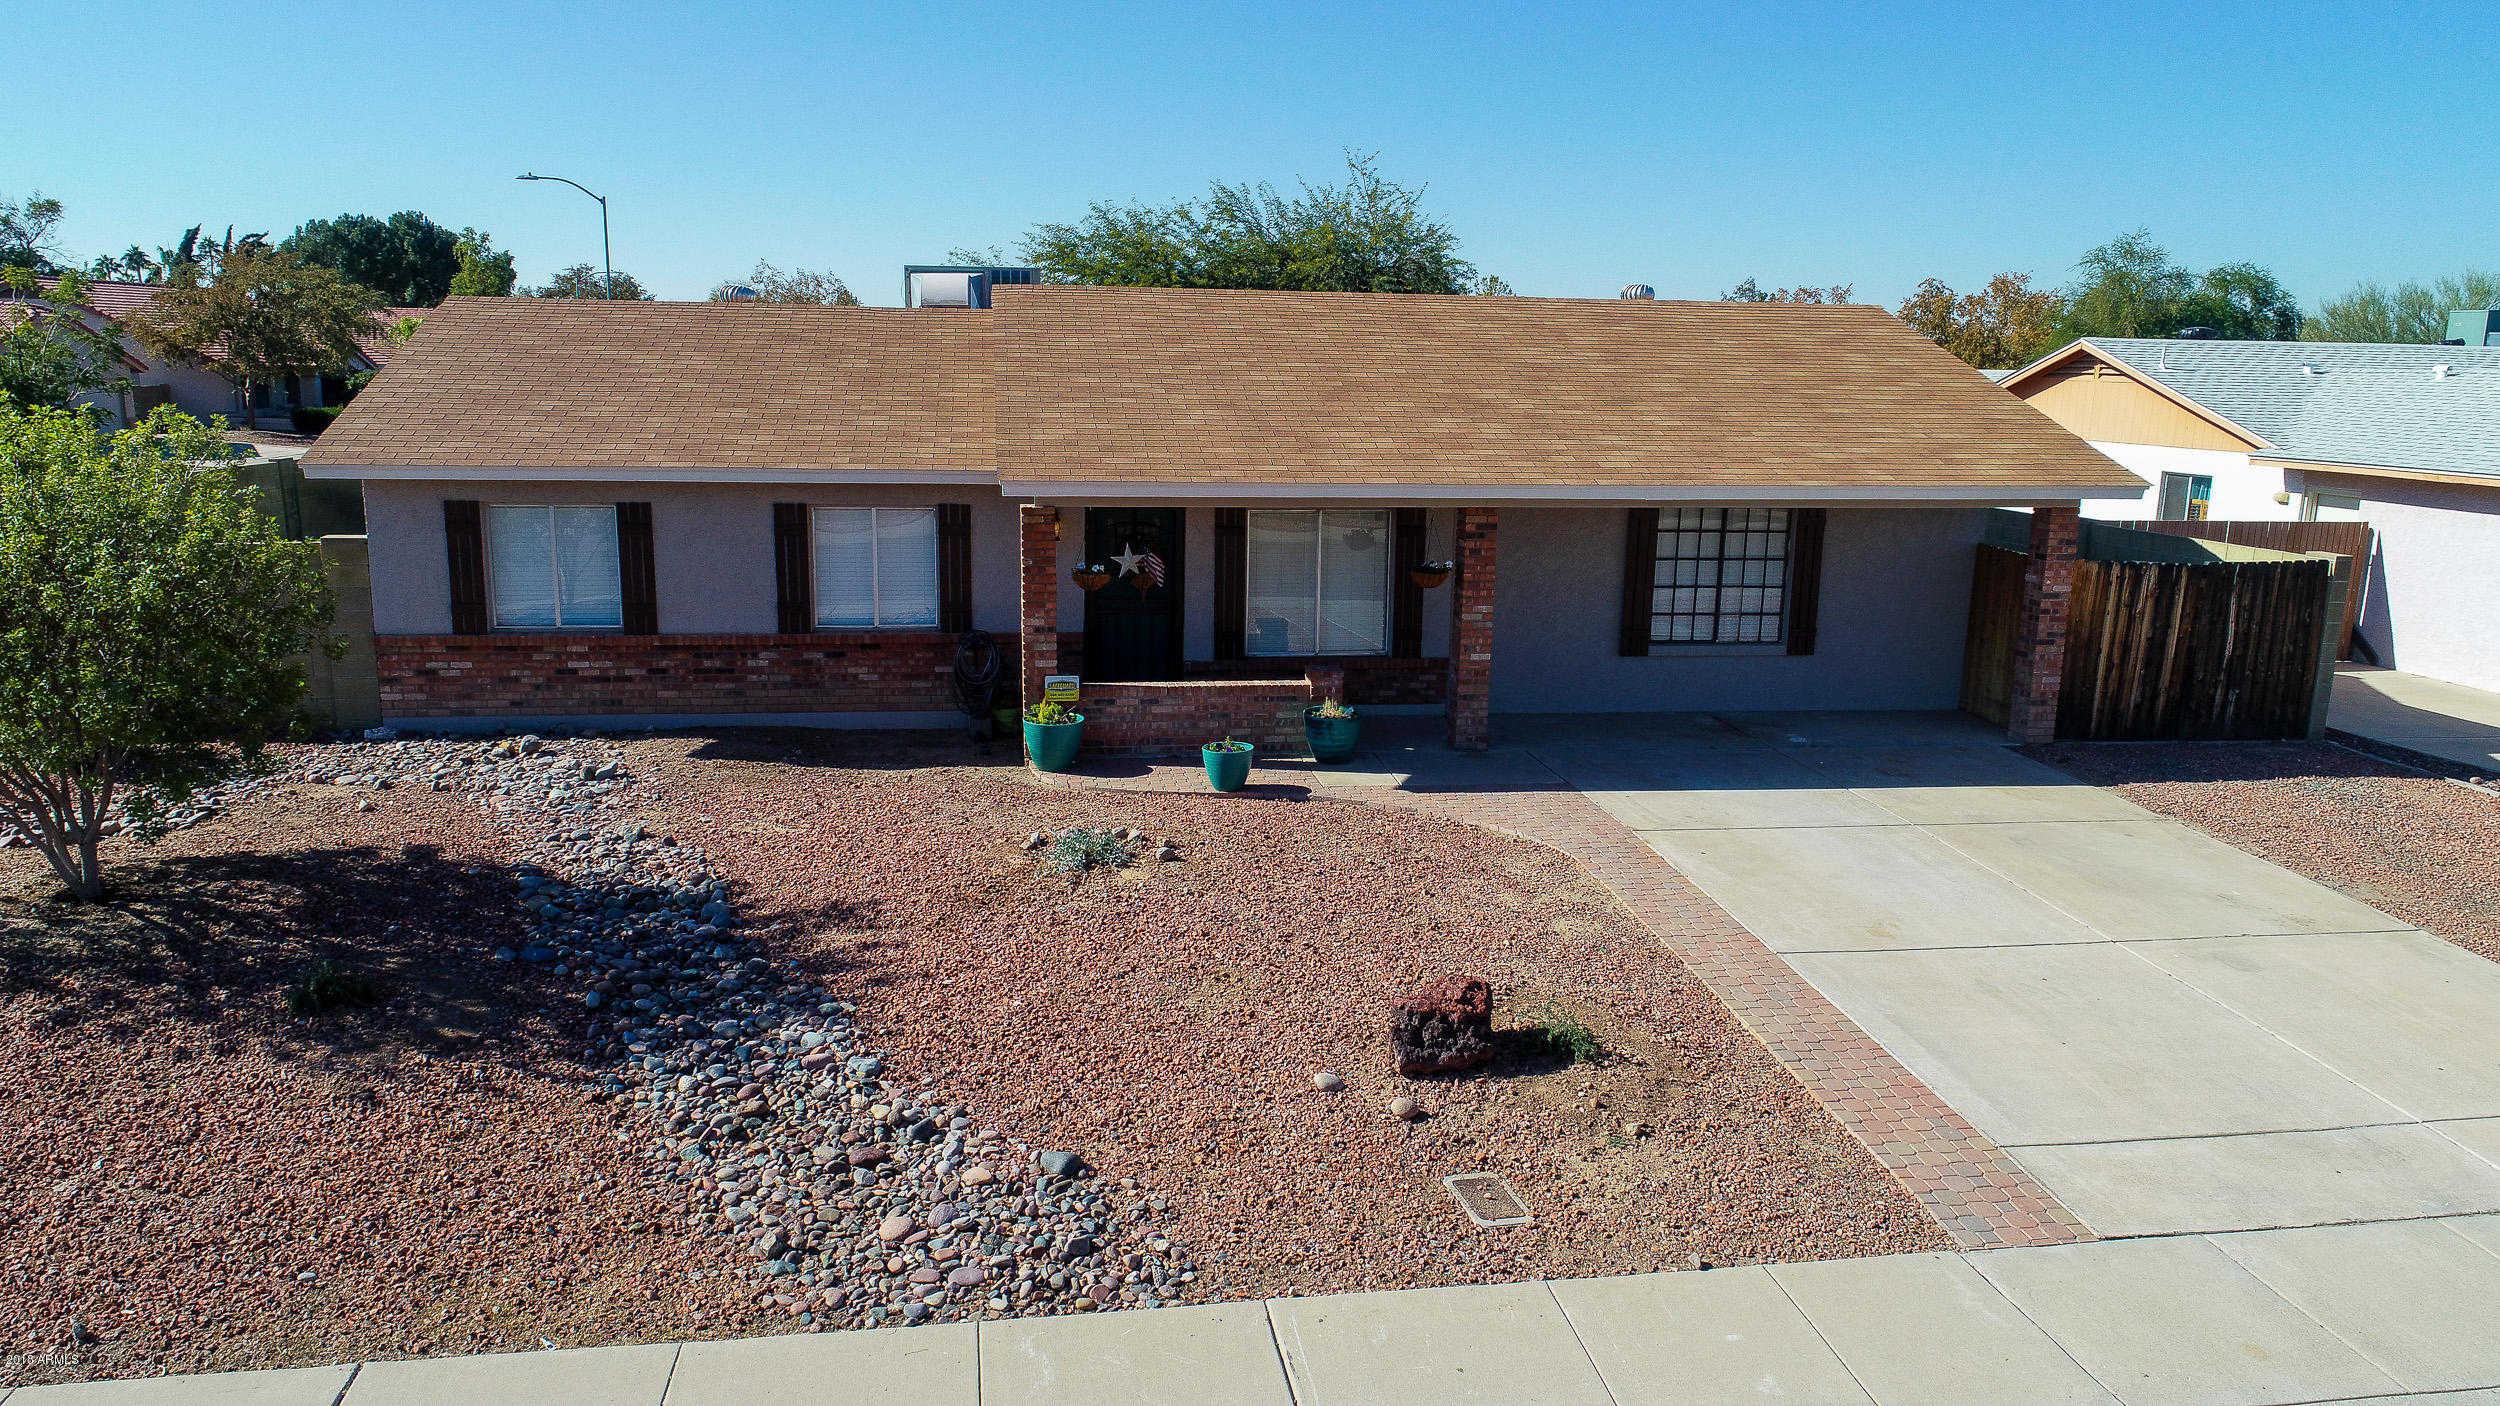 $245,900 - 3Br/2Ba - Home for Sale in Spyglass 2 Lot 1-70, Glendale